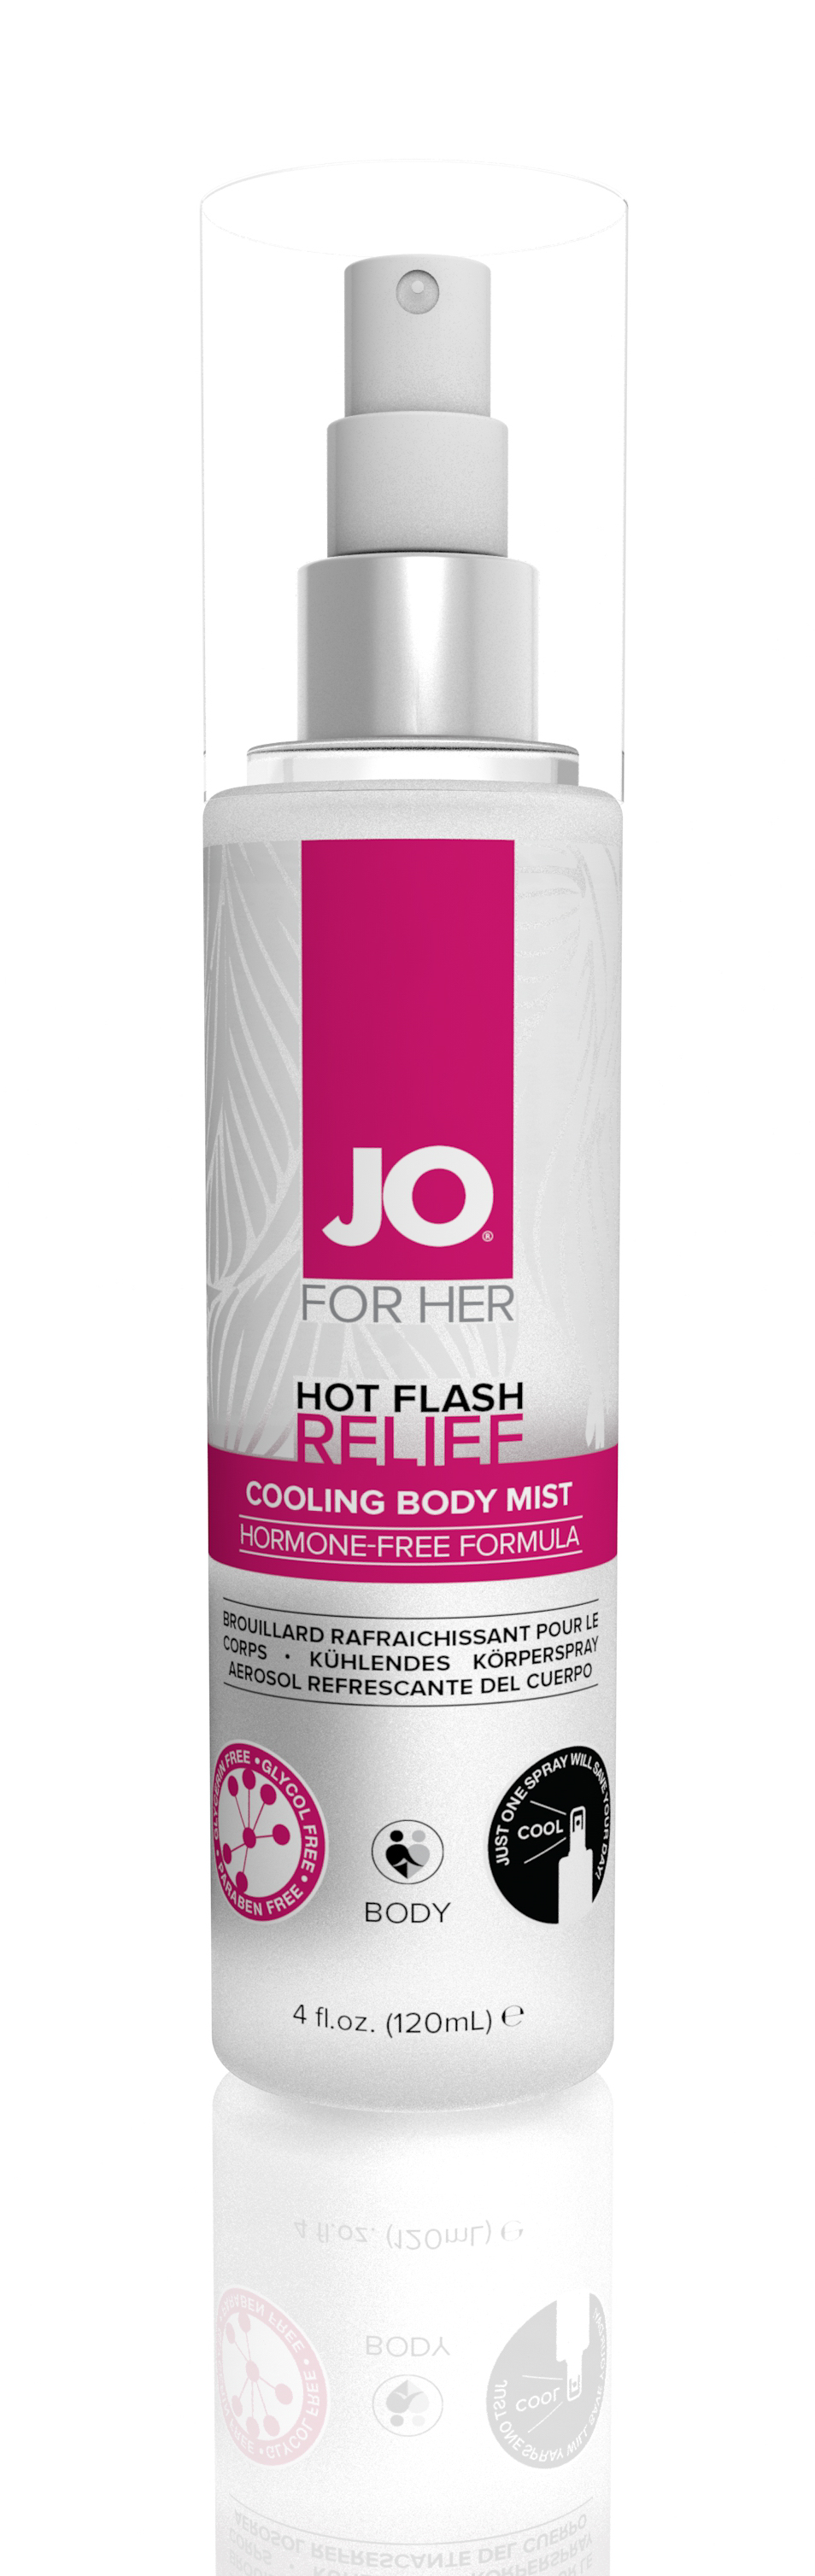 44063 - JO HOT FLASH RELIEF SPRAY - COOLING BODY MIST - 4fl.oz.120mL.jpg